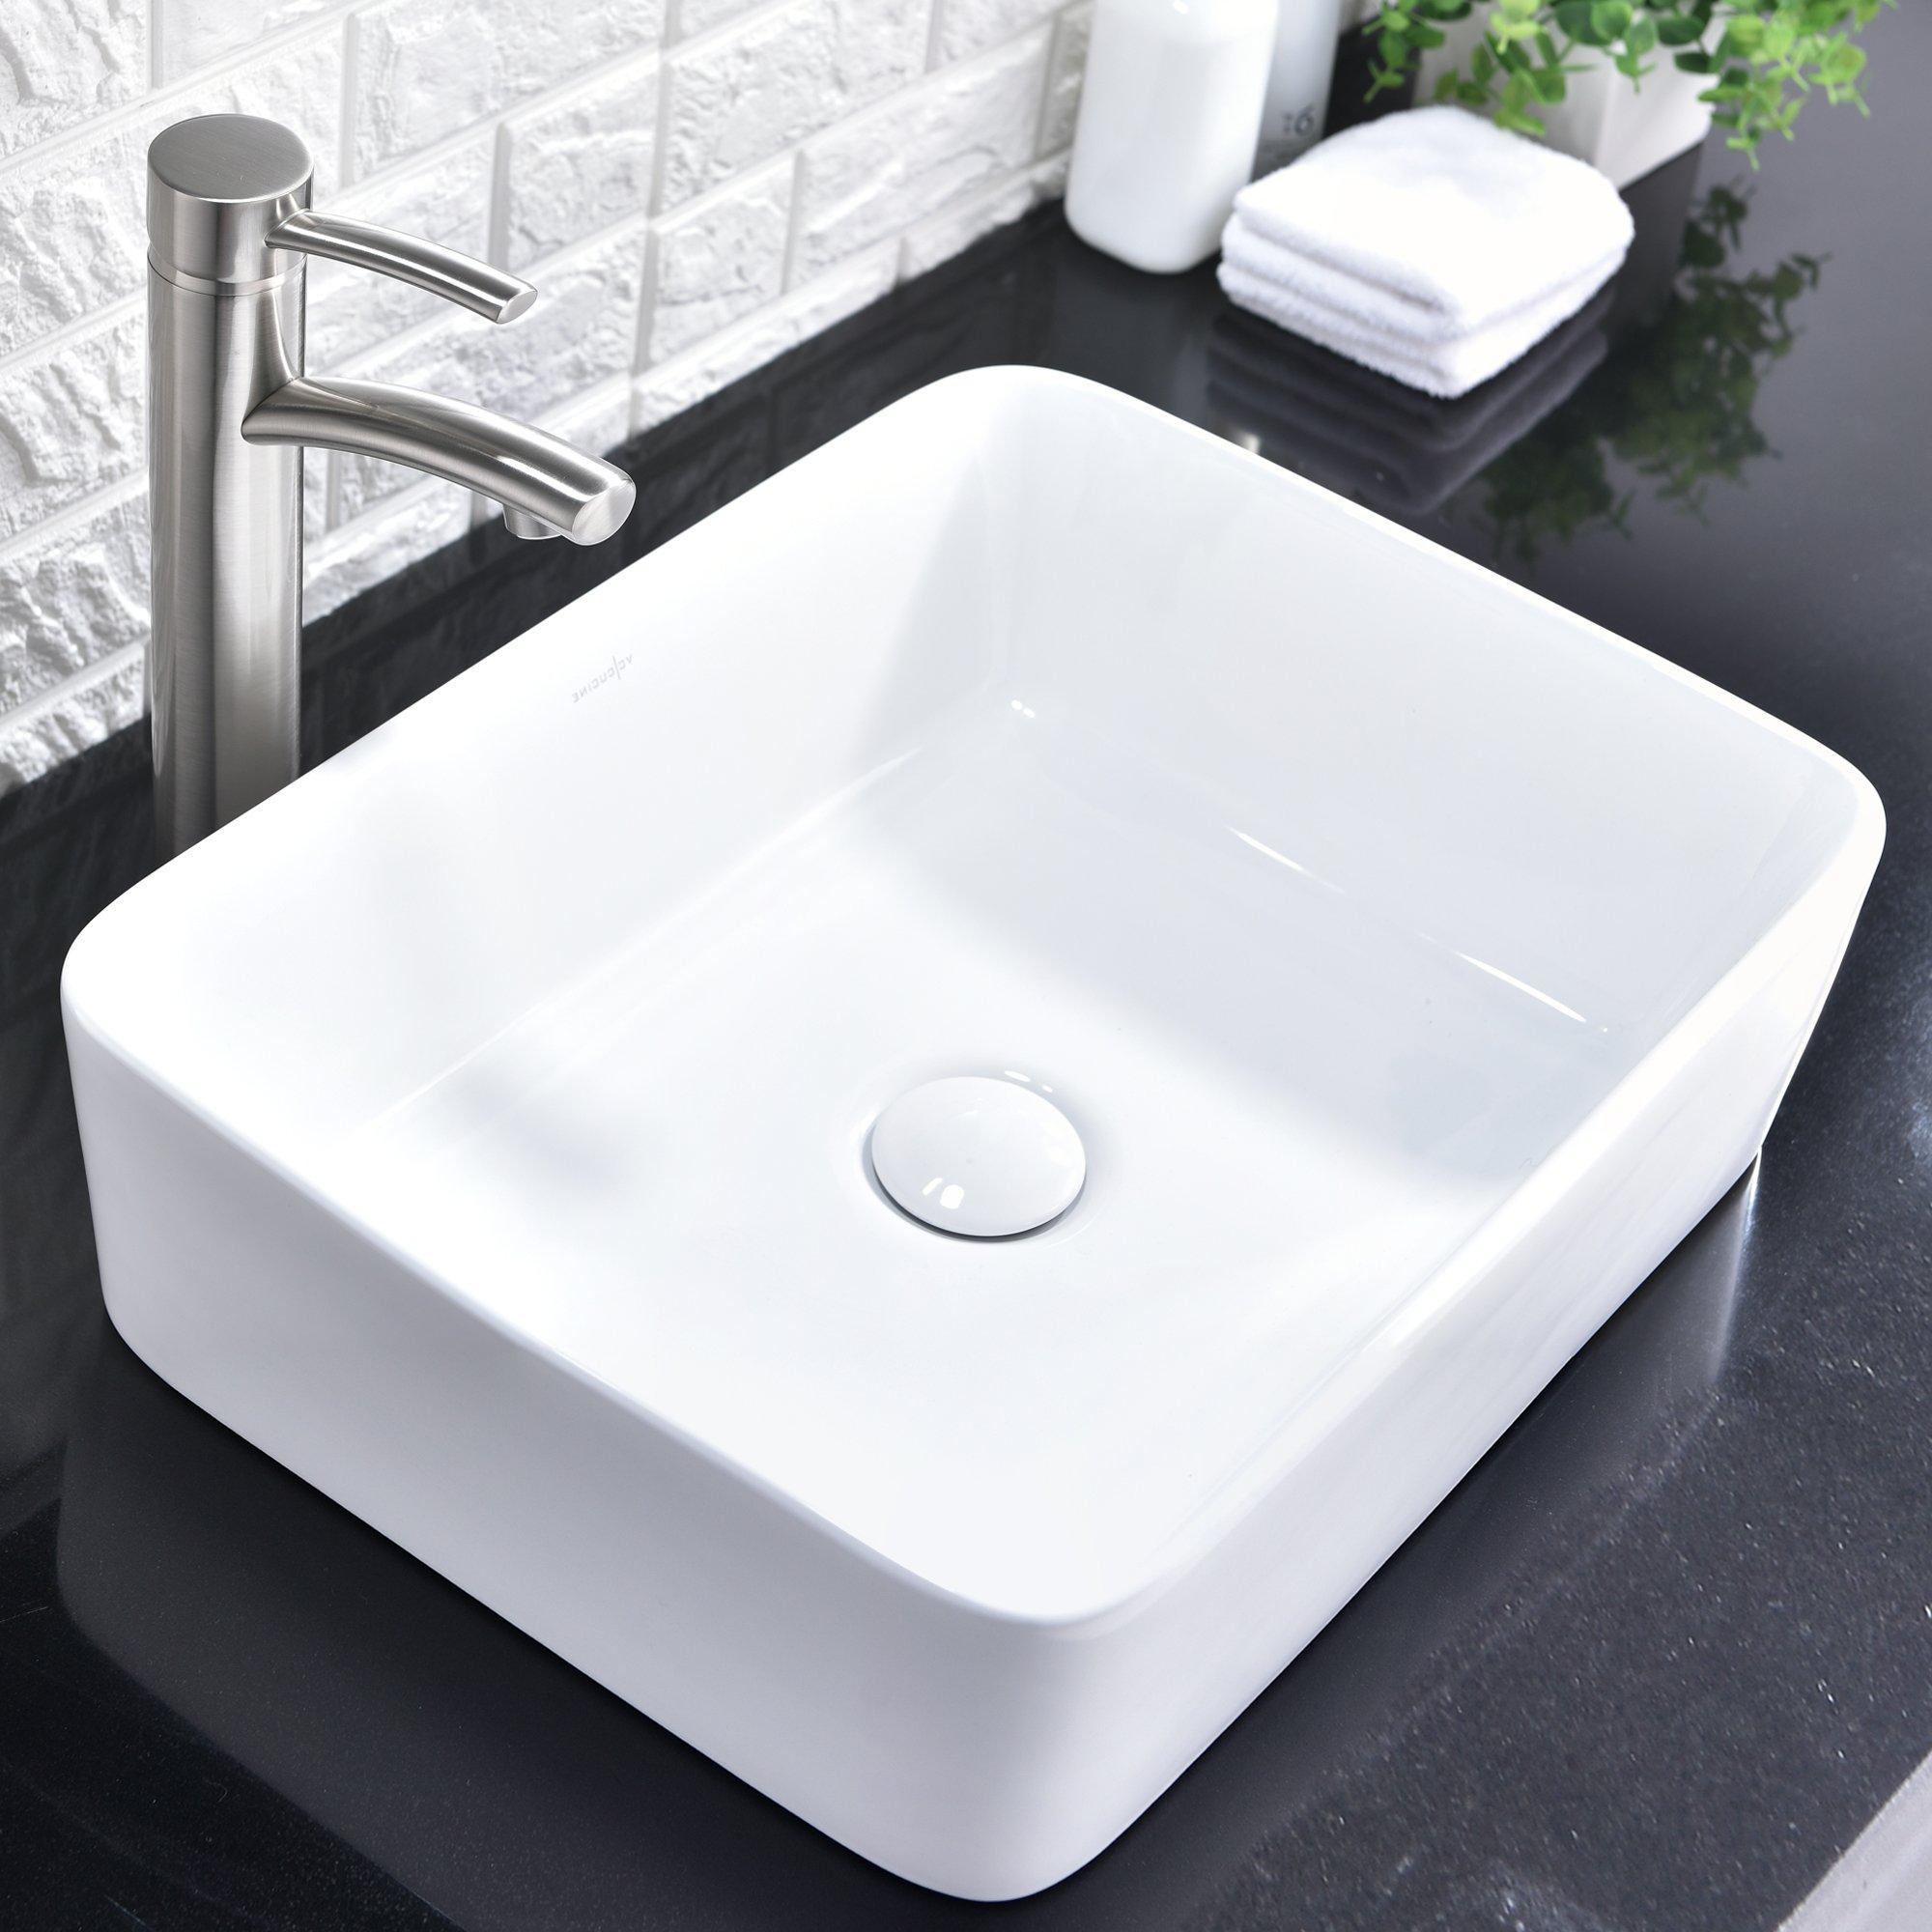 Comllen Above Counter White Porcelain Ceramic Bathroom Vessel Sink Art Basin by Comllen